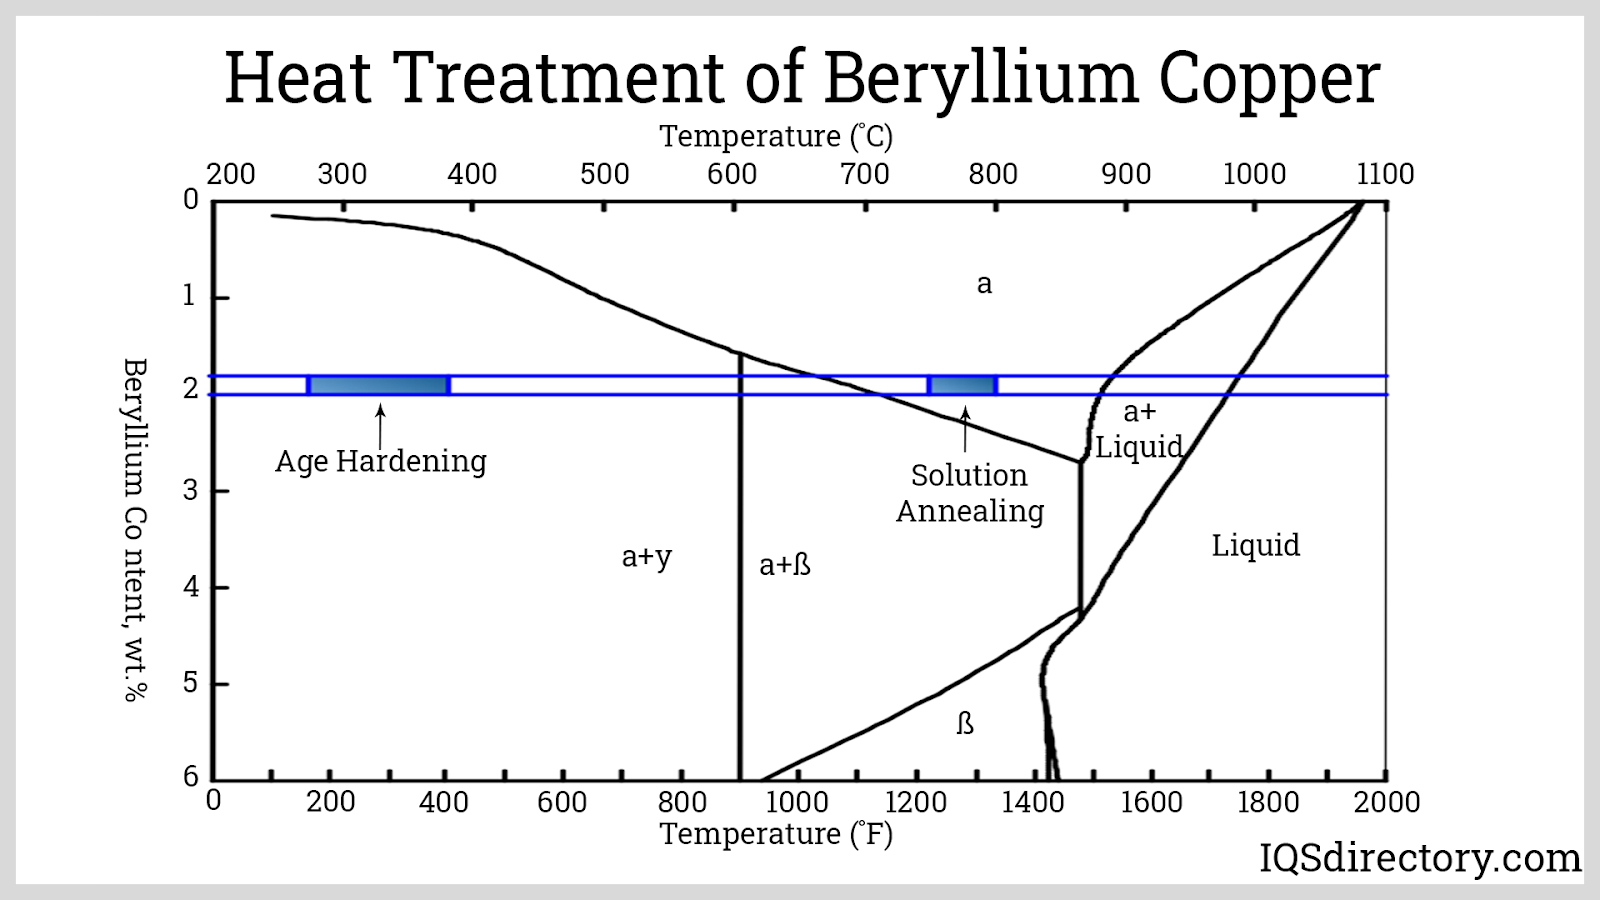 Heat Treatment of Beryllium Copper